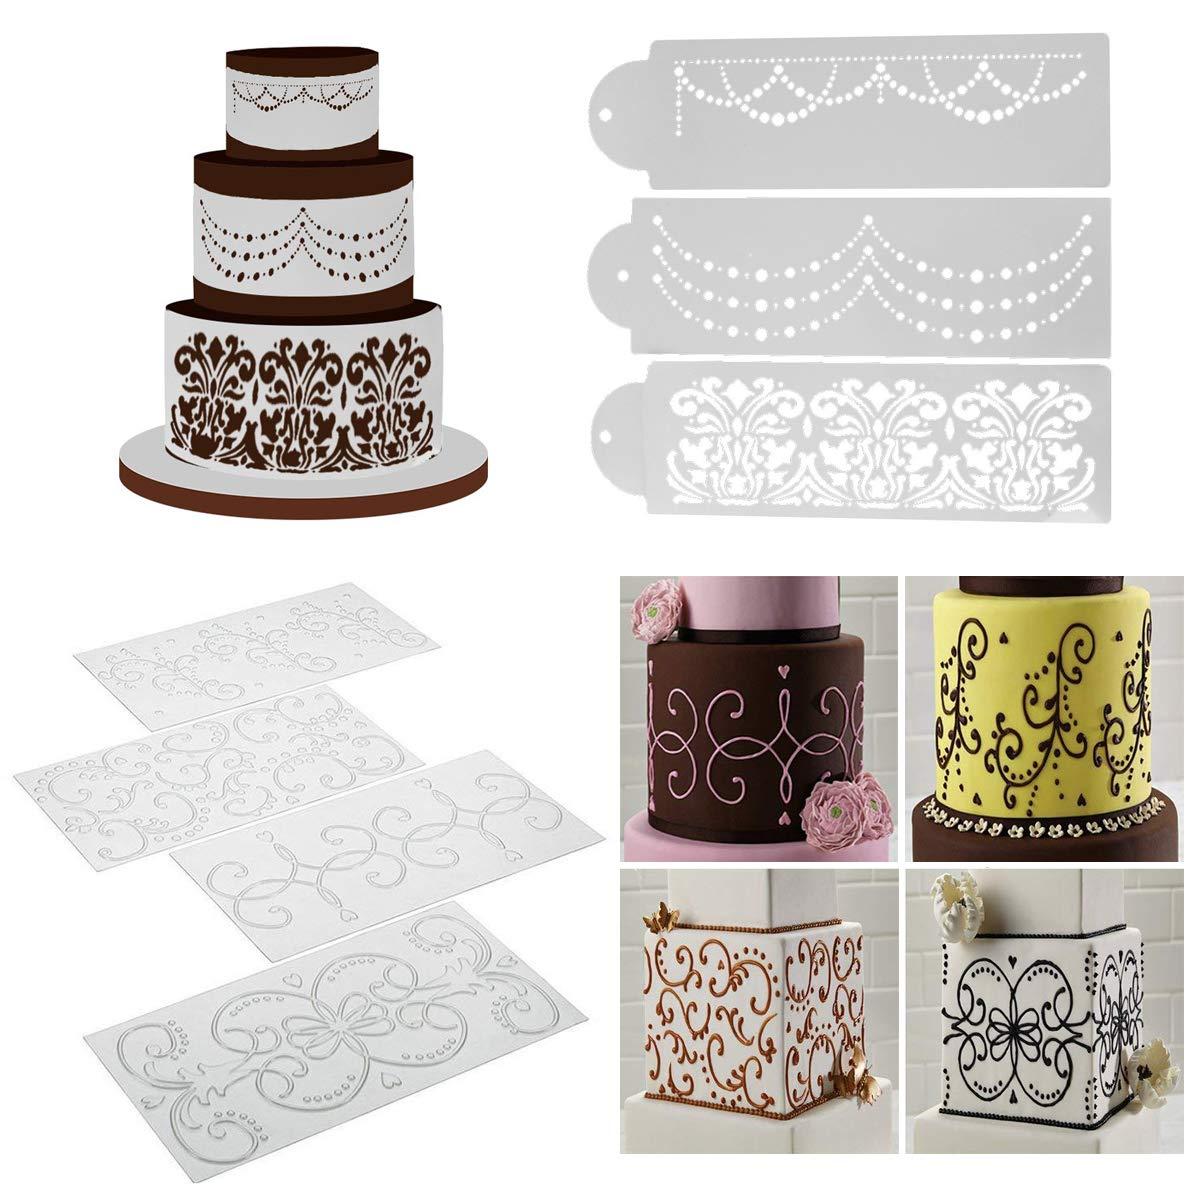 Wedding Cake Stencil Template, BENBO 7Pcs Cake Decorating Embossing Plastic Spray Floral Cake Cookie Fondant Side Baking Mesh Stencil Wedding Decor Tool